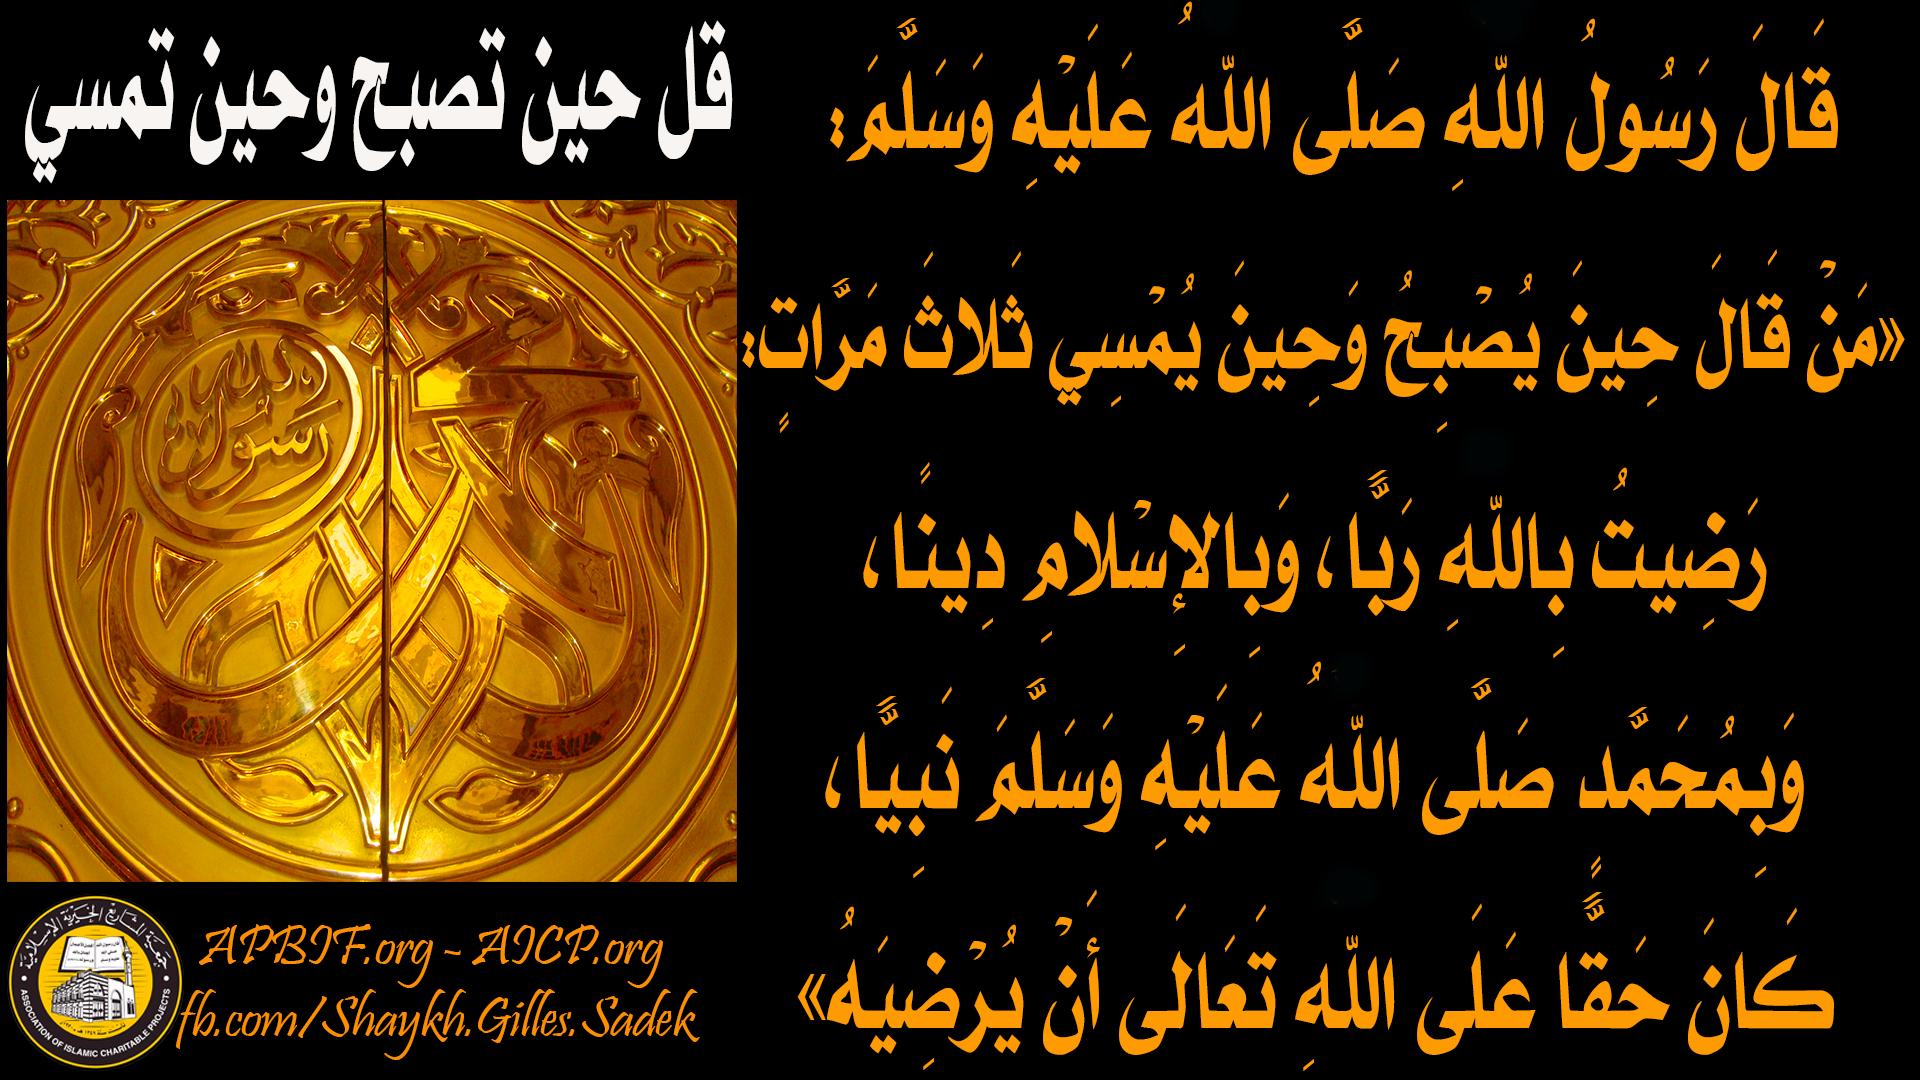 Shaykh Gilles Sadek Movie Posters Youtube Islam